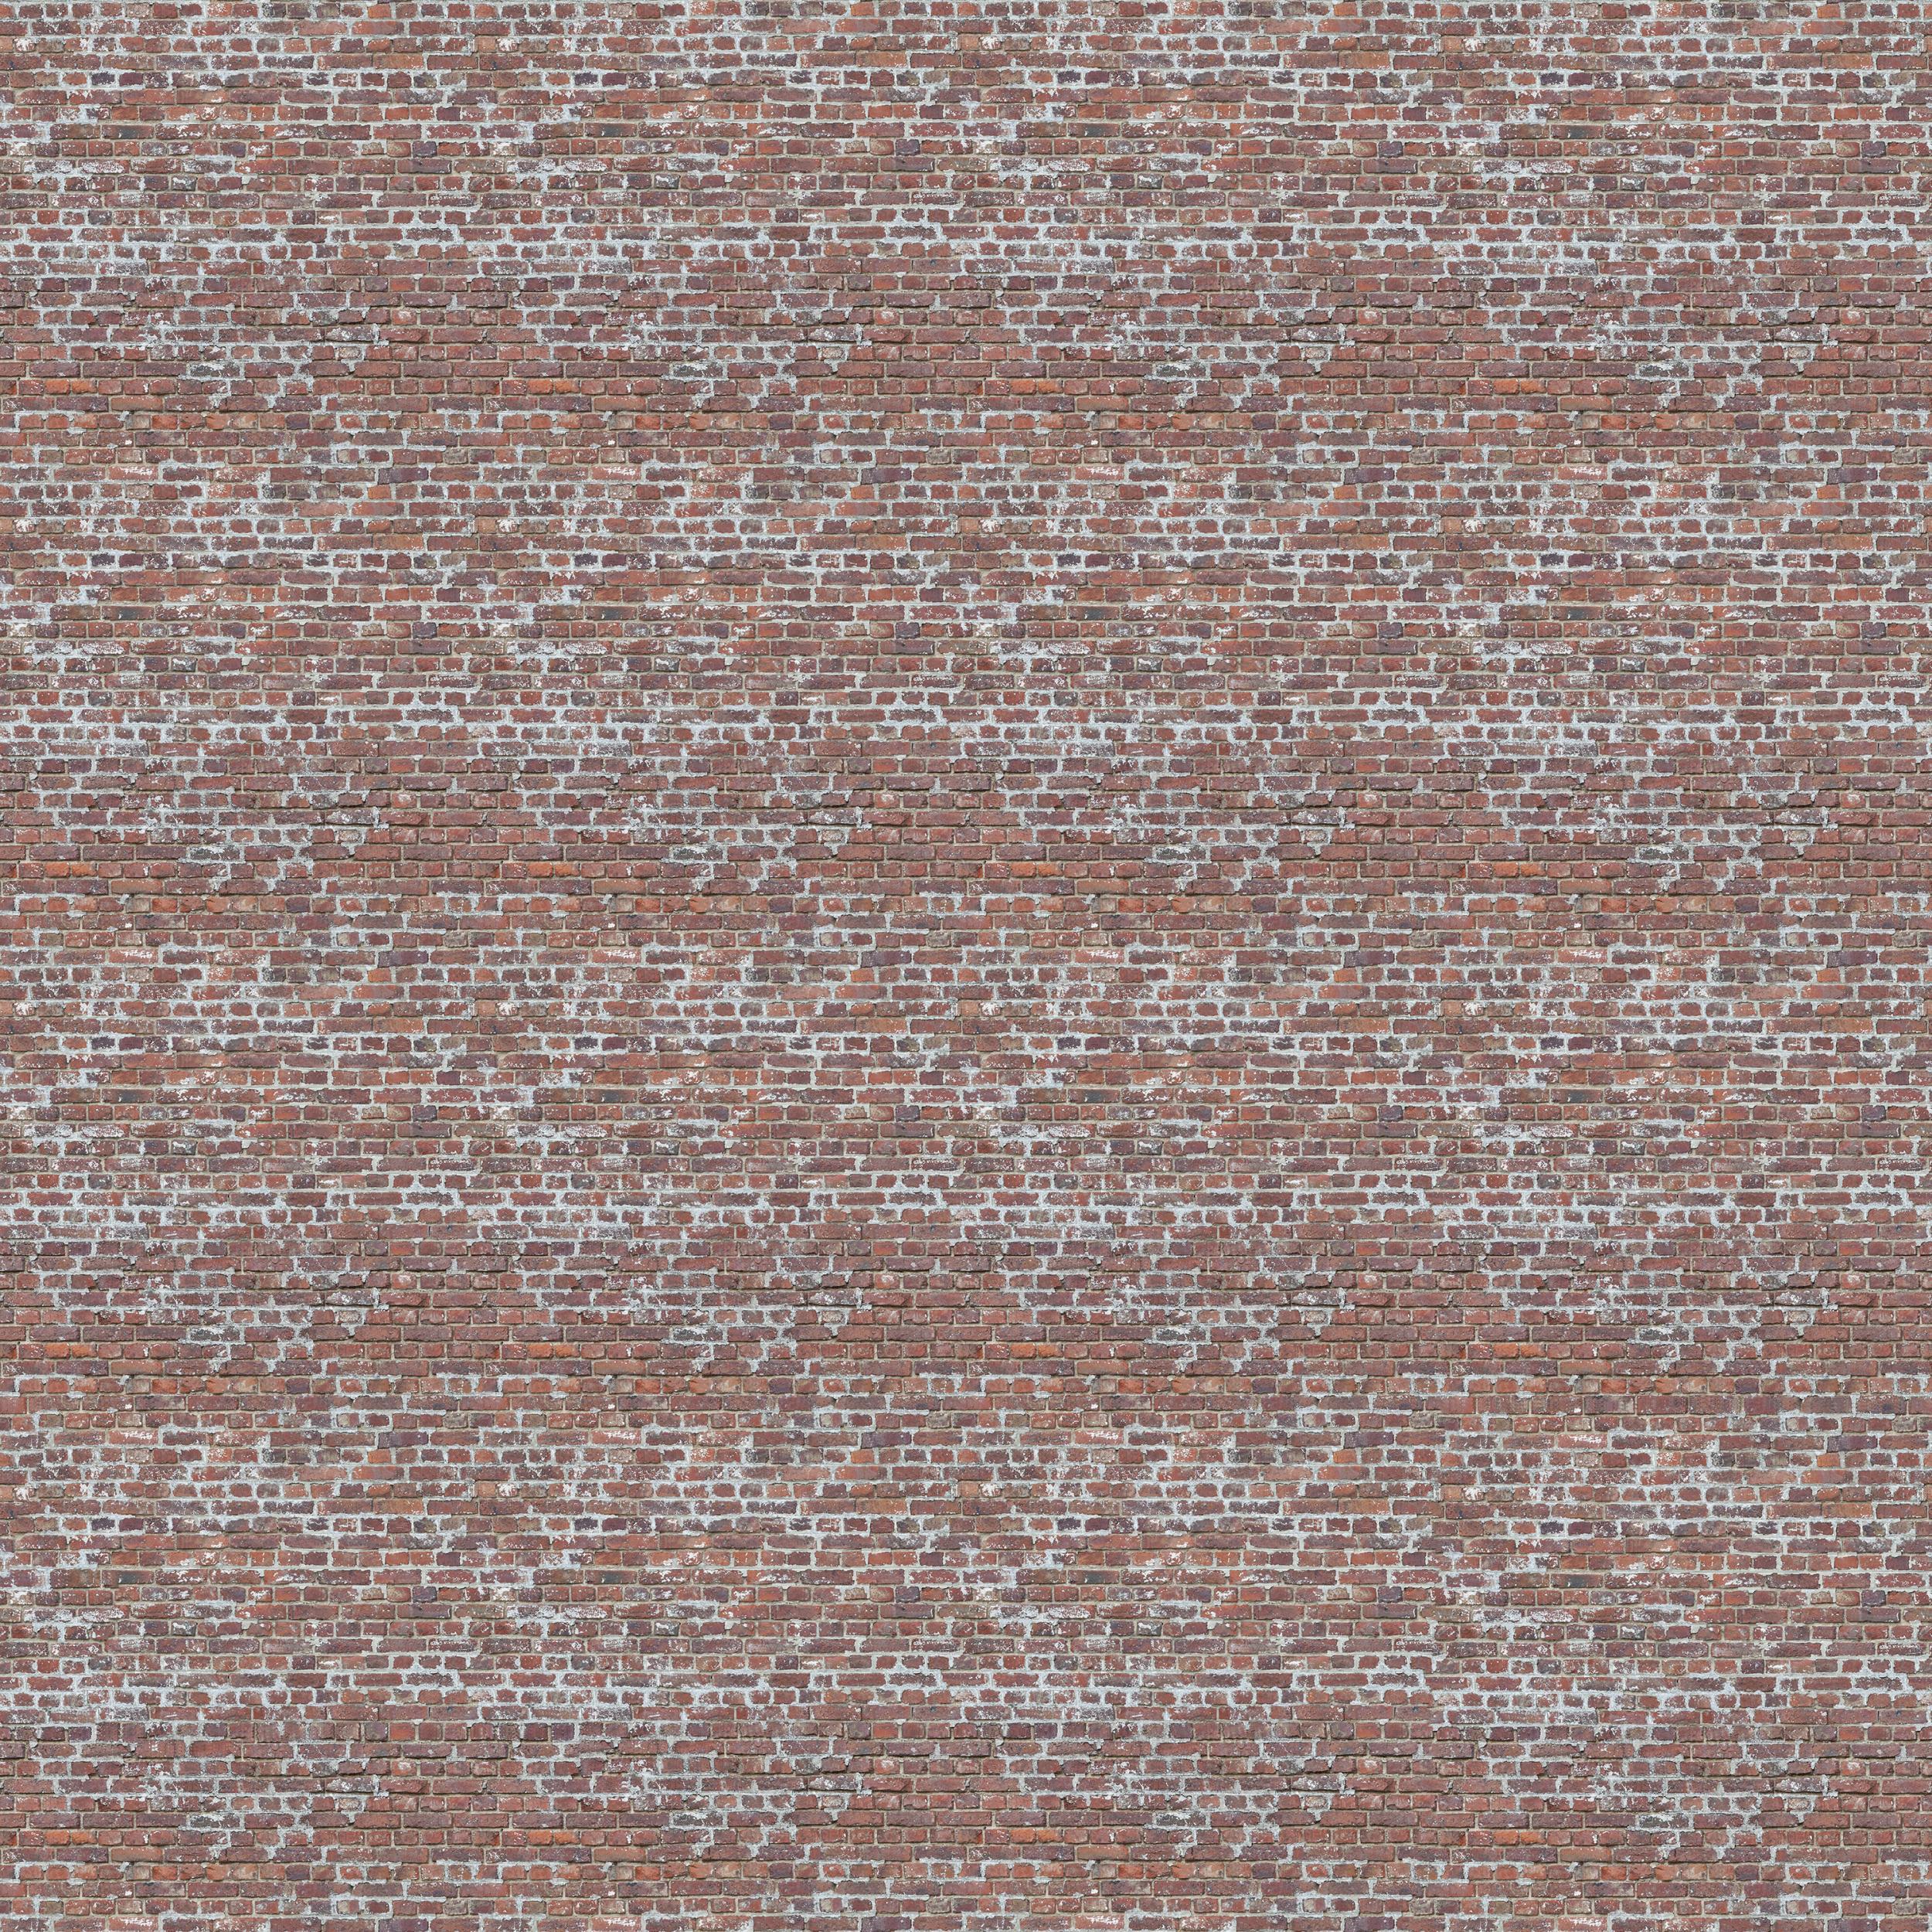 AI_34_005_brick_color1.jpg